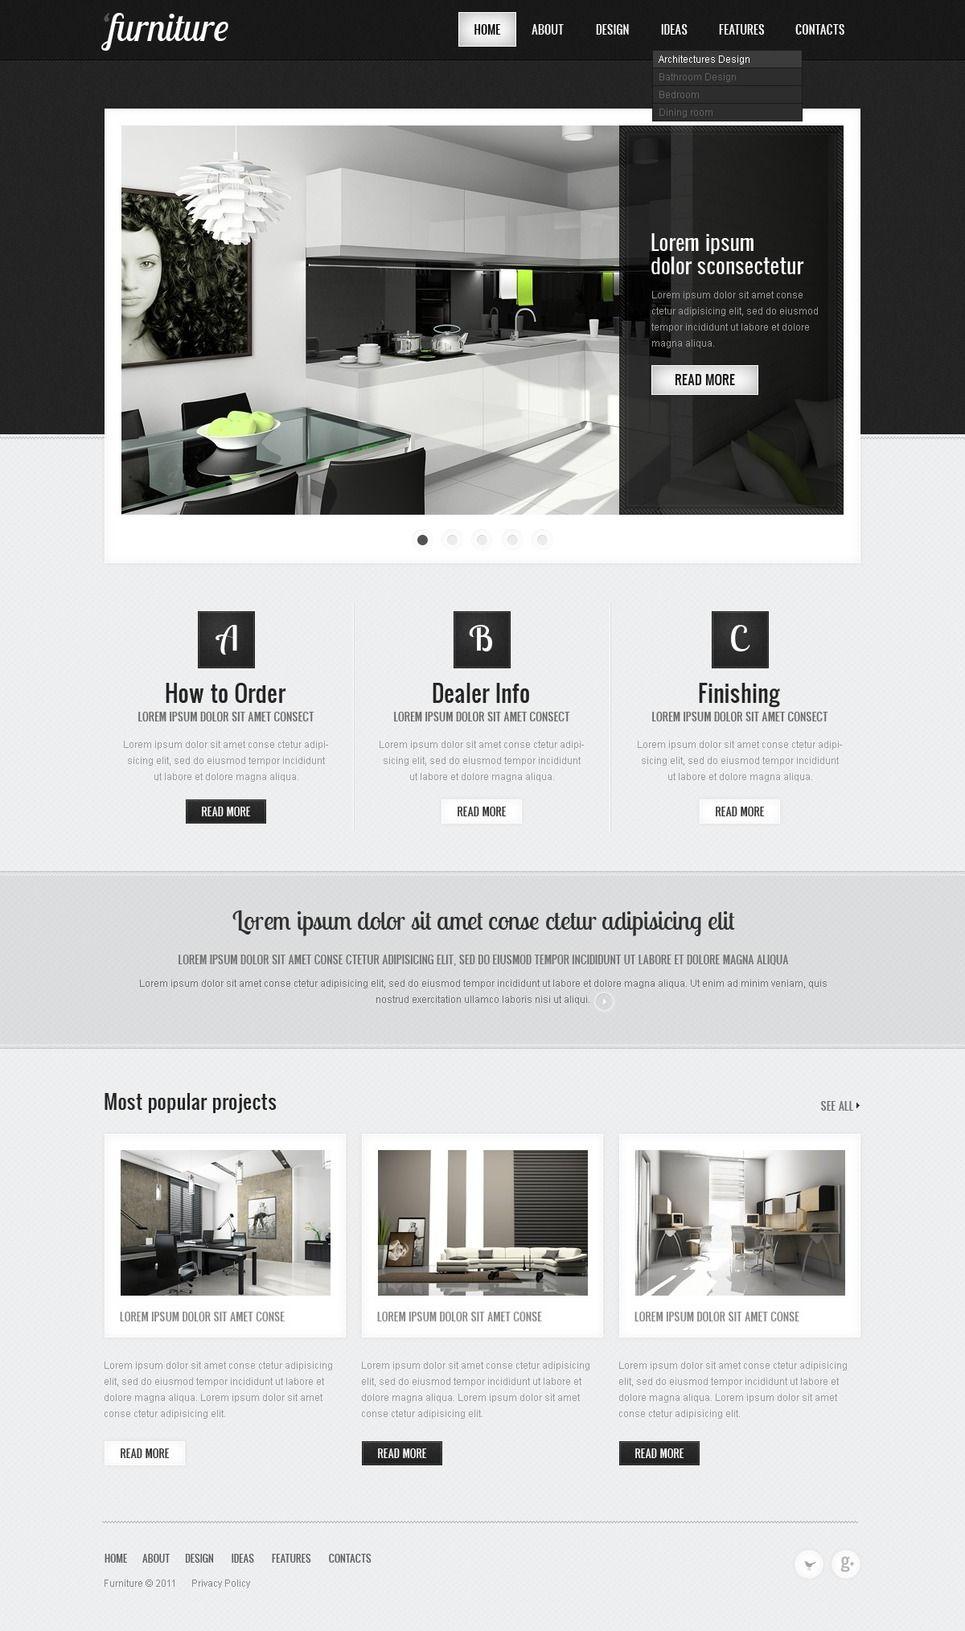 furniture psd template #41525 | website design layout, web